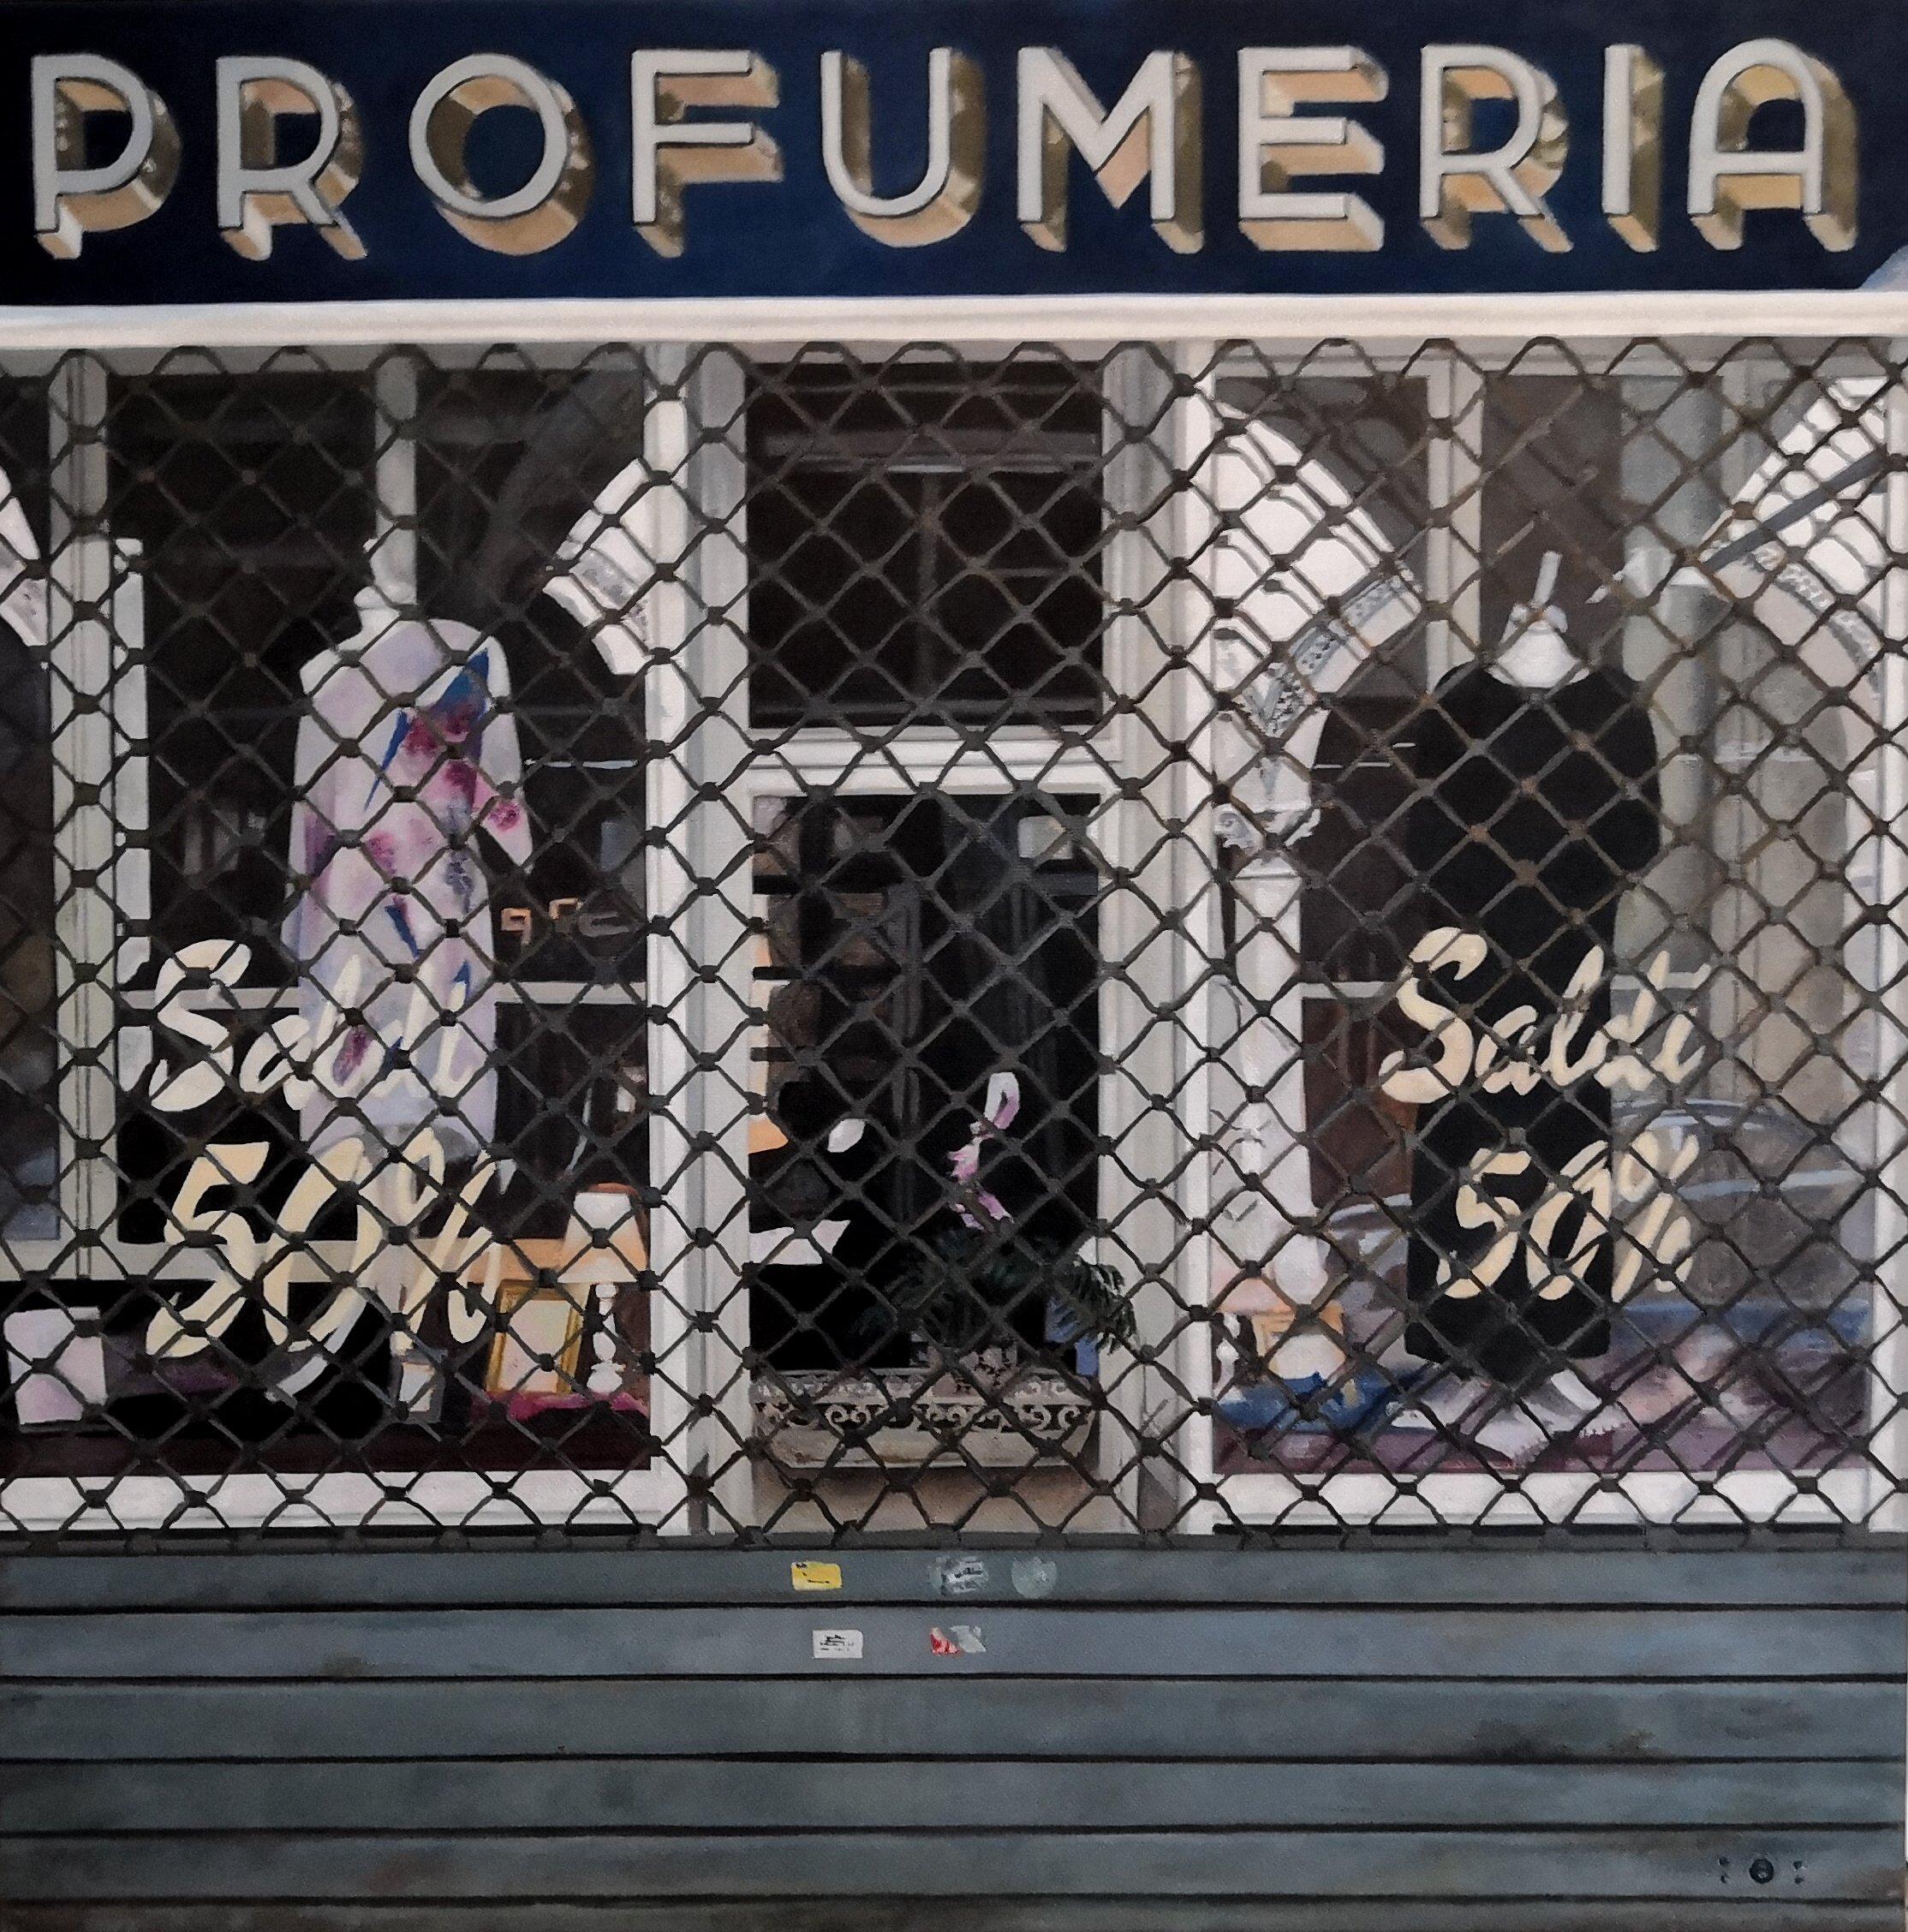 Anke Rohde | Profumeria | Öl auf Leinwand | 60 x 60 cm | 2019